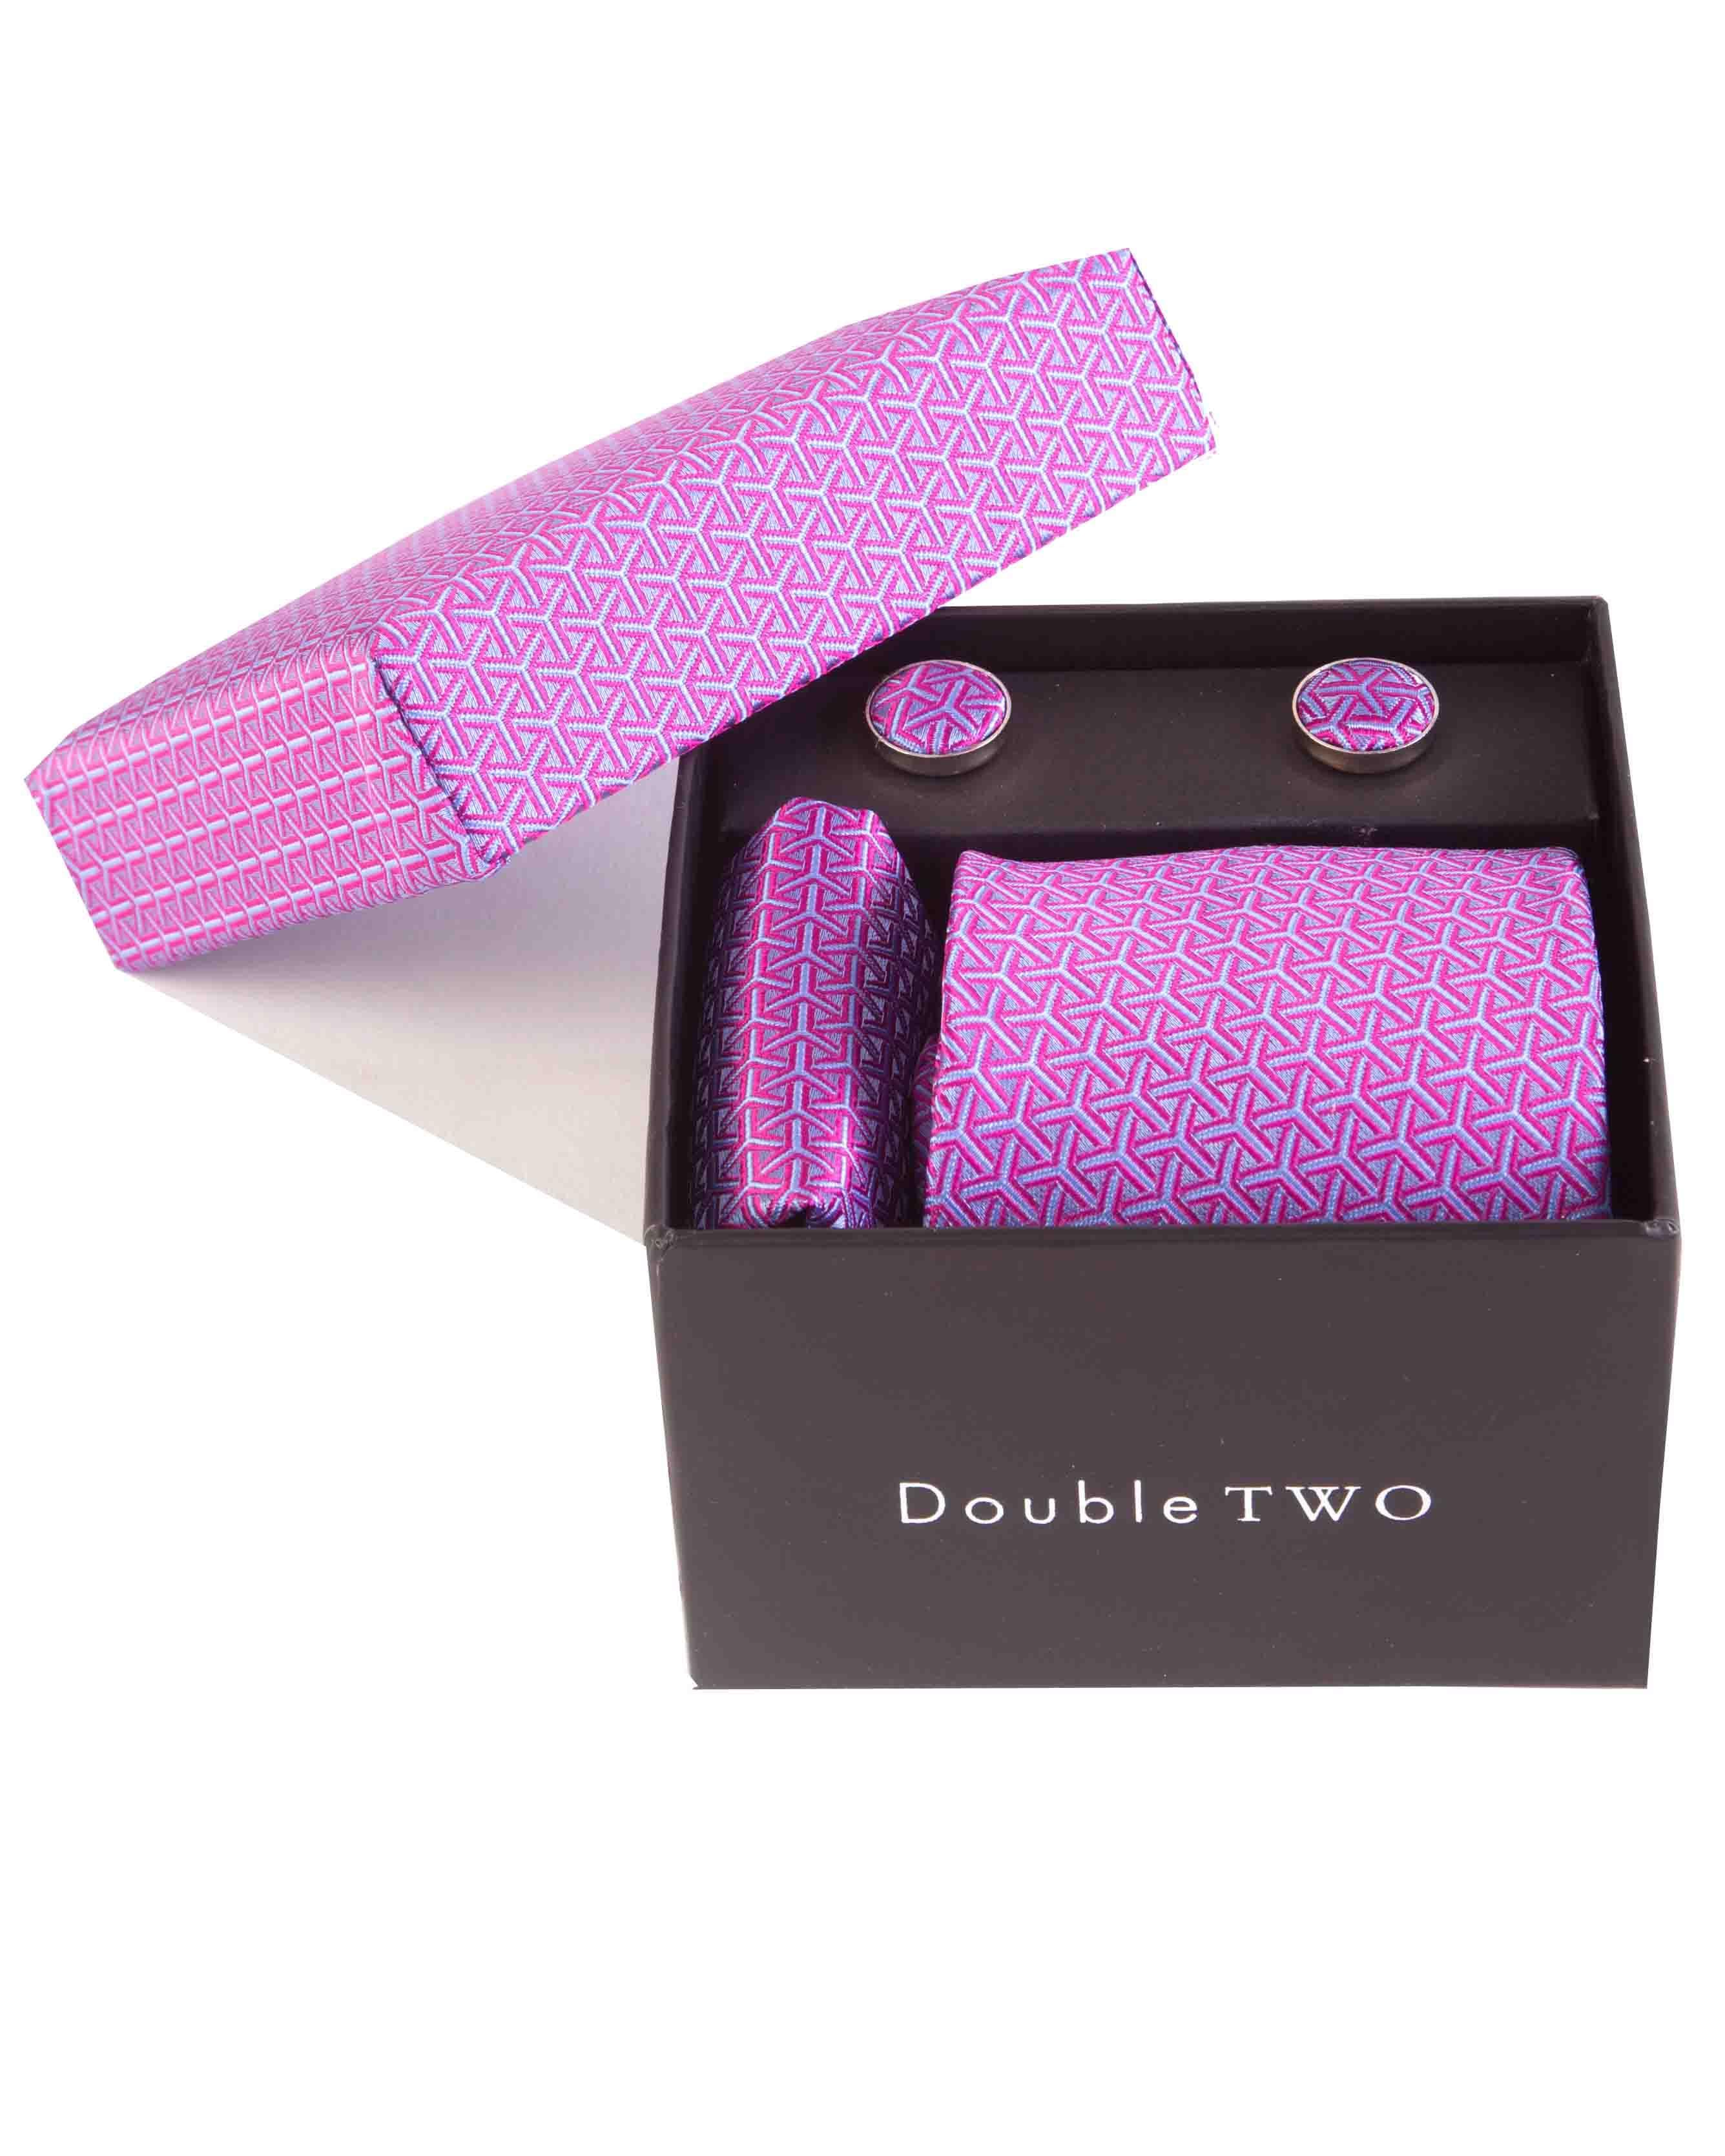 tie, handkerchief and cufflink box sets